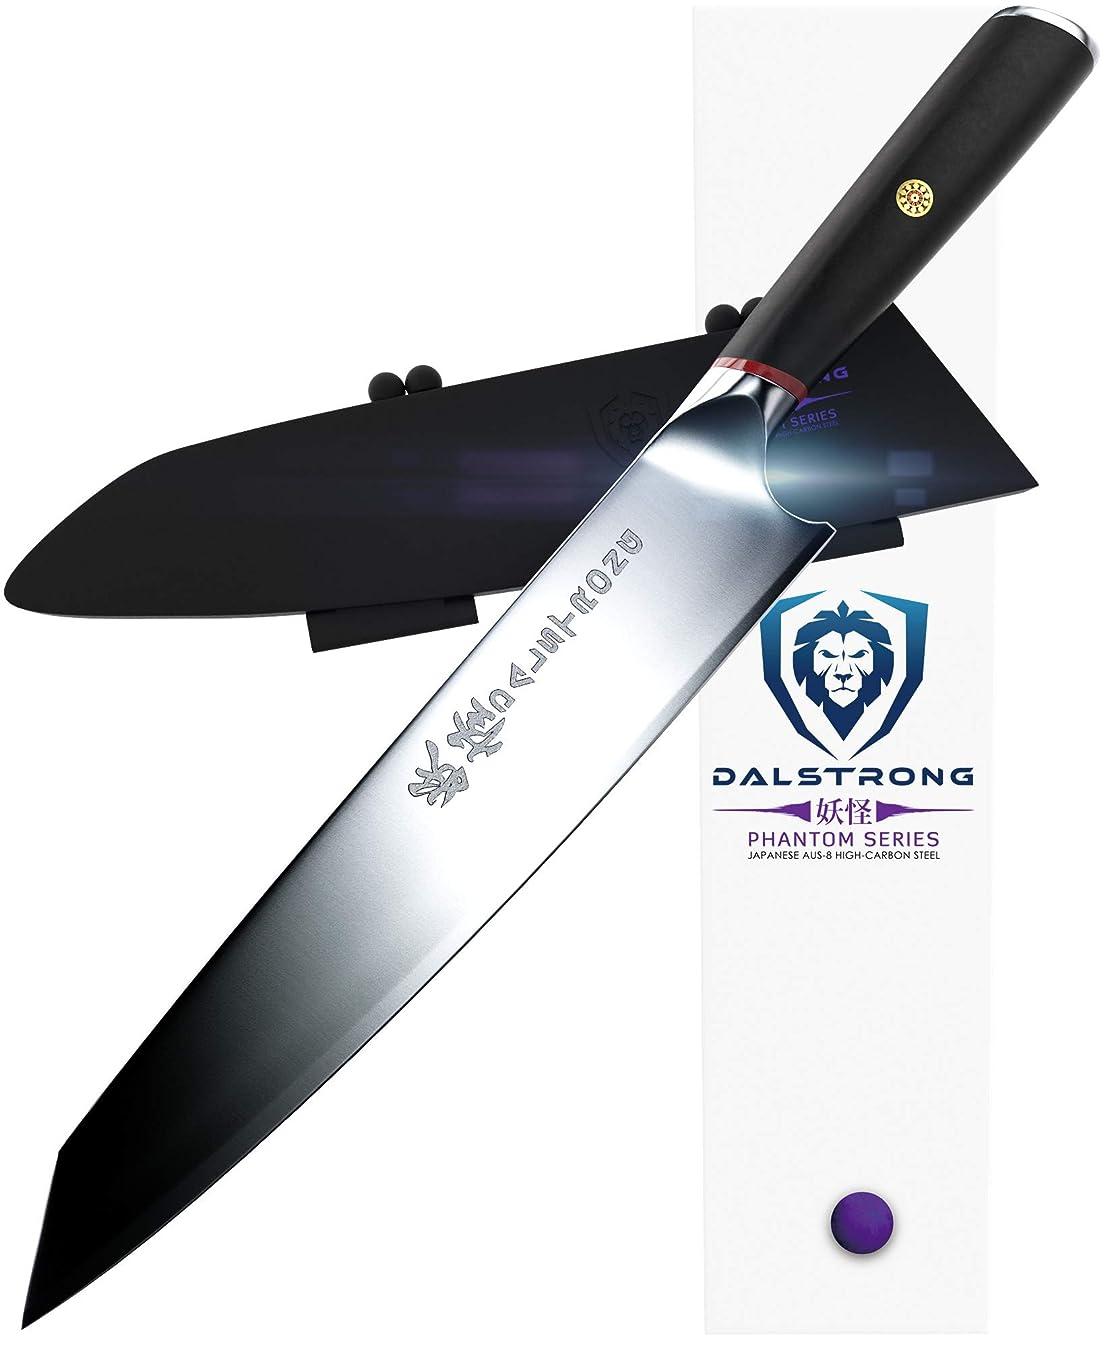 DALSTRONG Phantom Series - Japanese High-Carbon - AUS8 Steel - Sheath (9.5